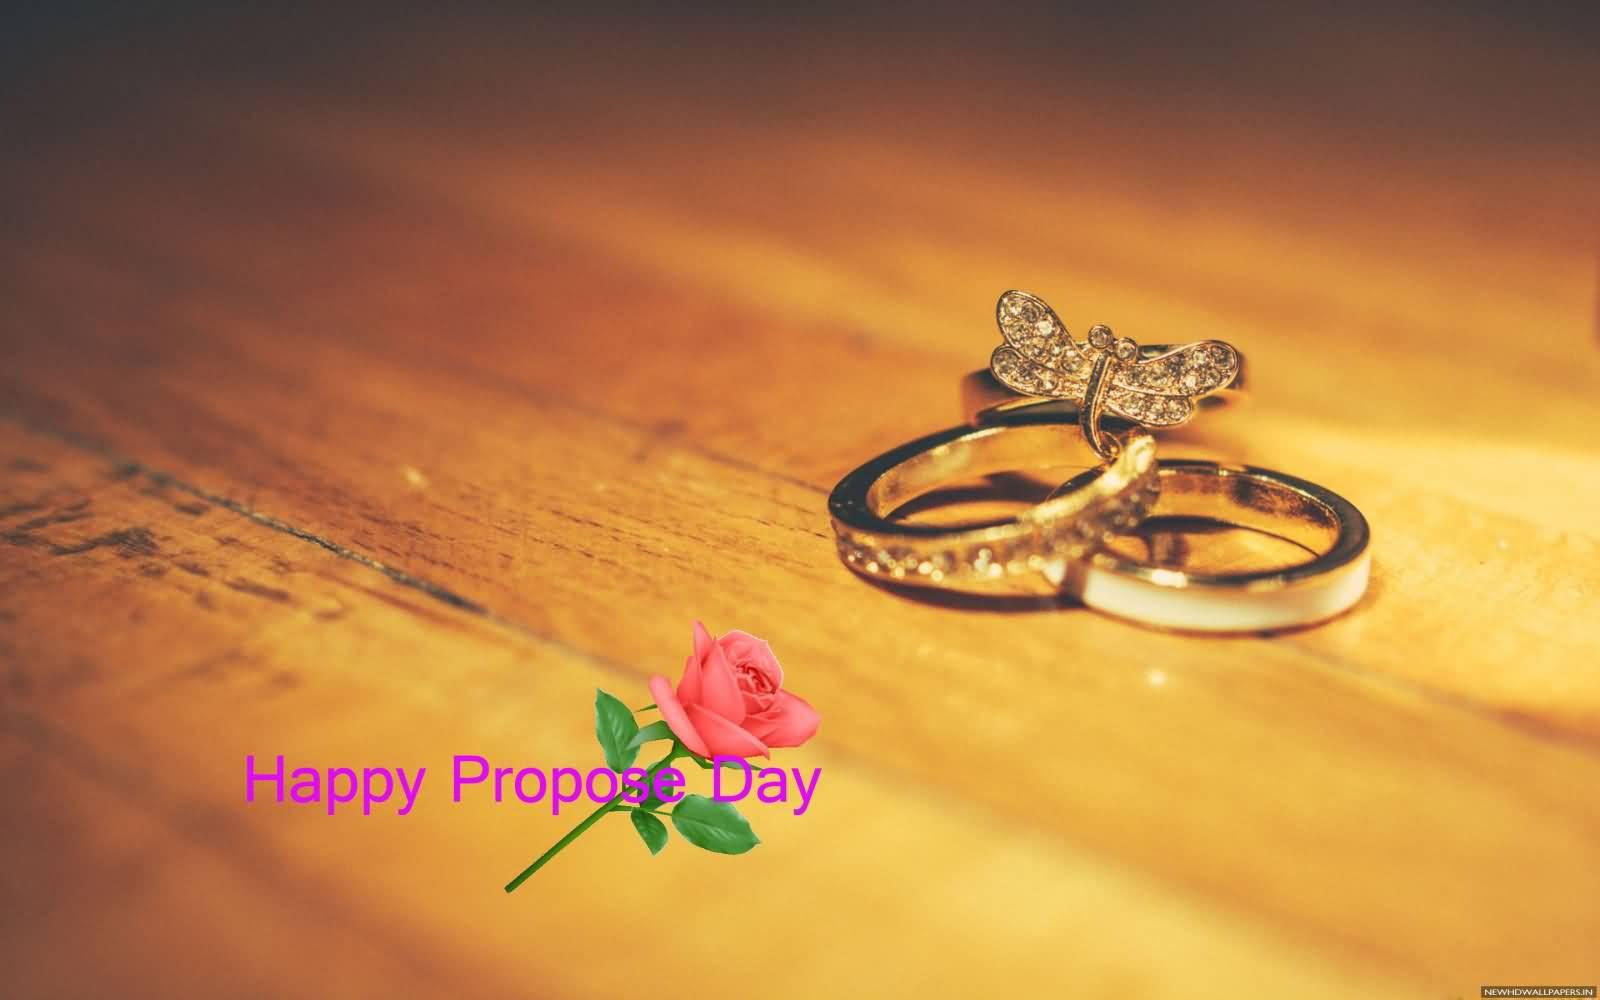 propose day wallpaper hd download